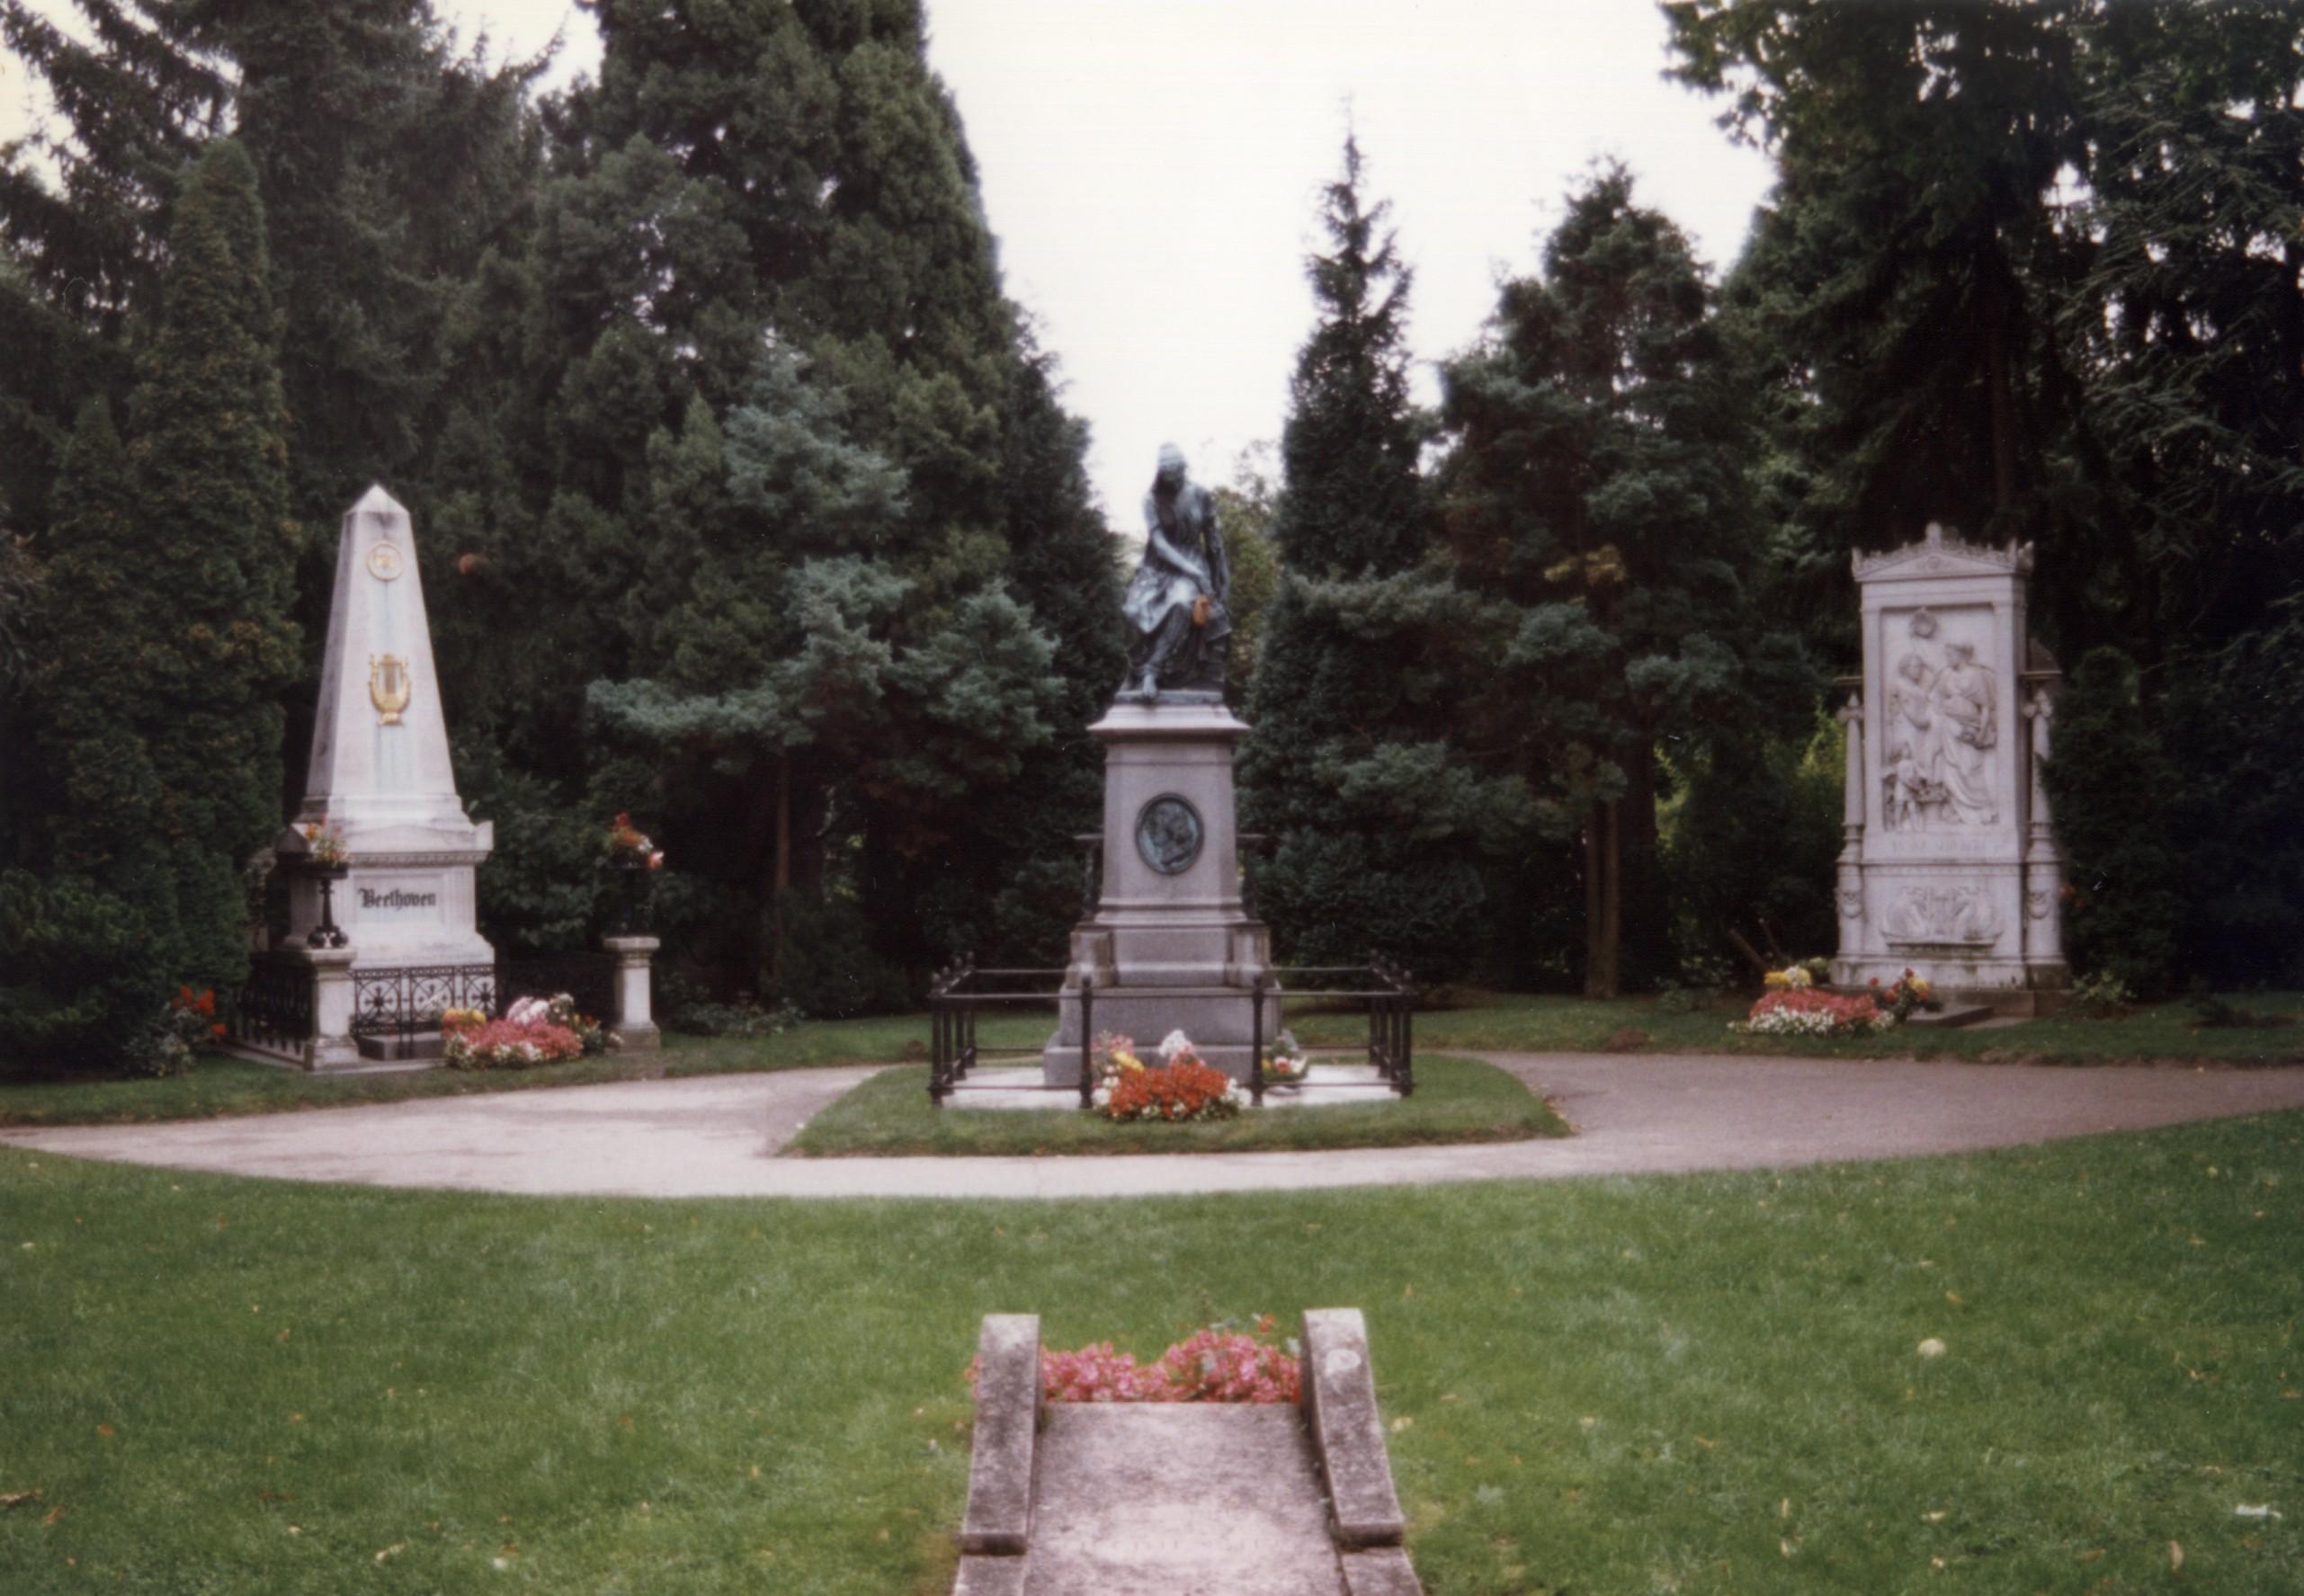 Ludwig van Beethoven Beethoven - Annie Fischer - Beethoven Sonatas - Pathétique - Waldstein